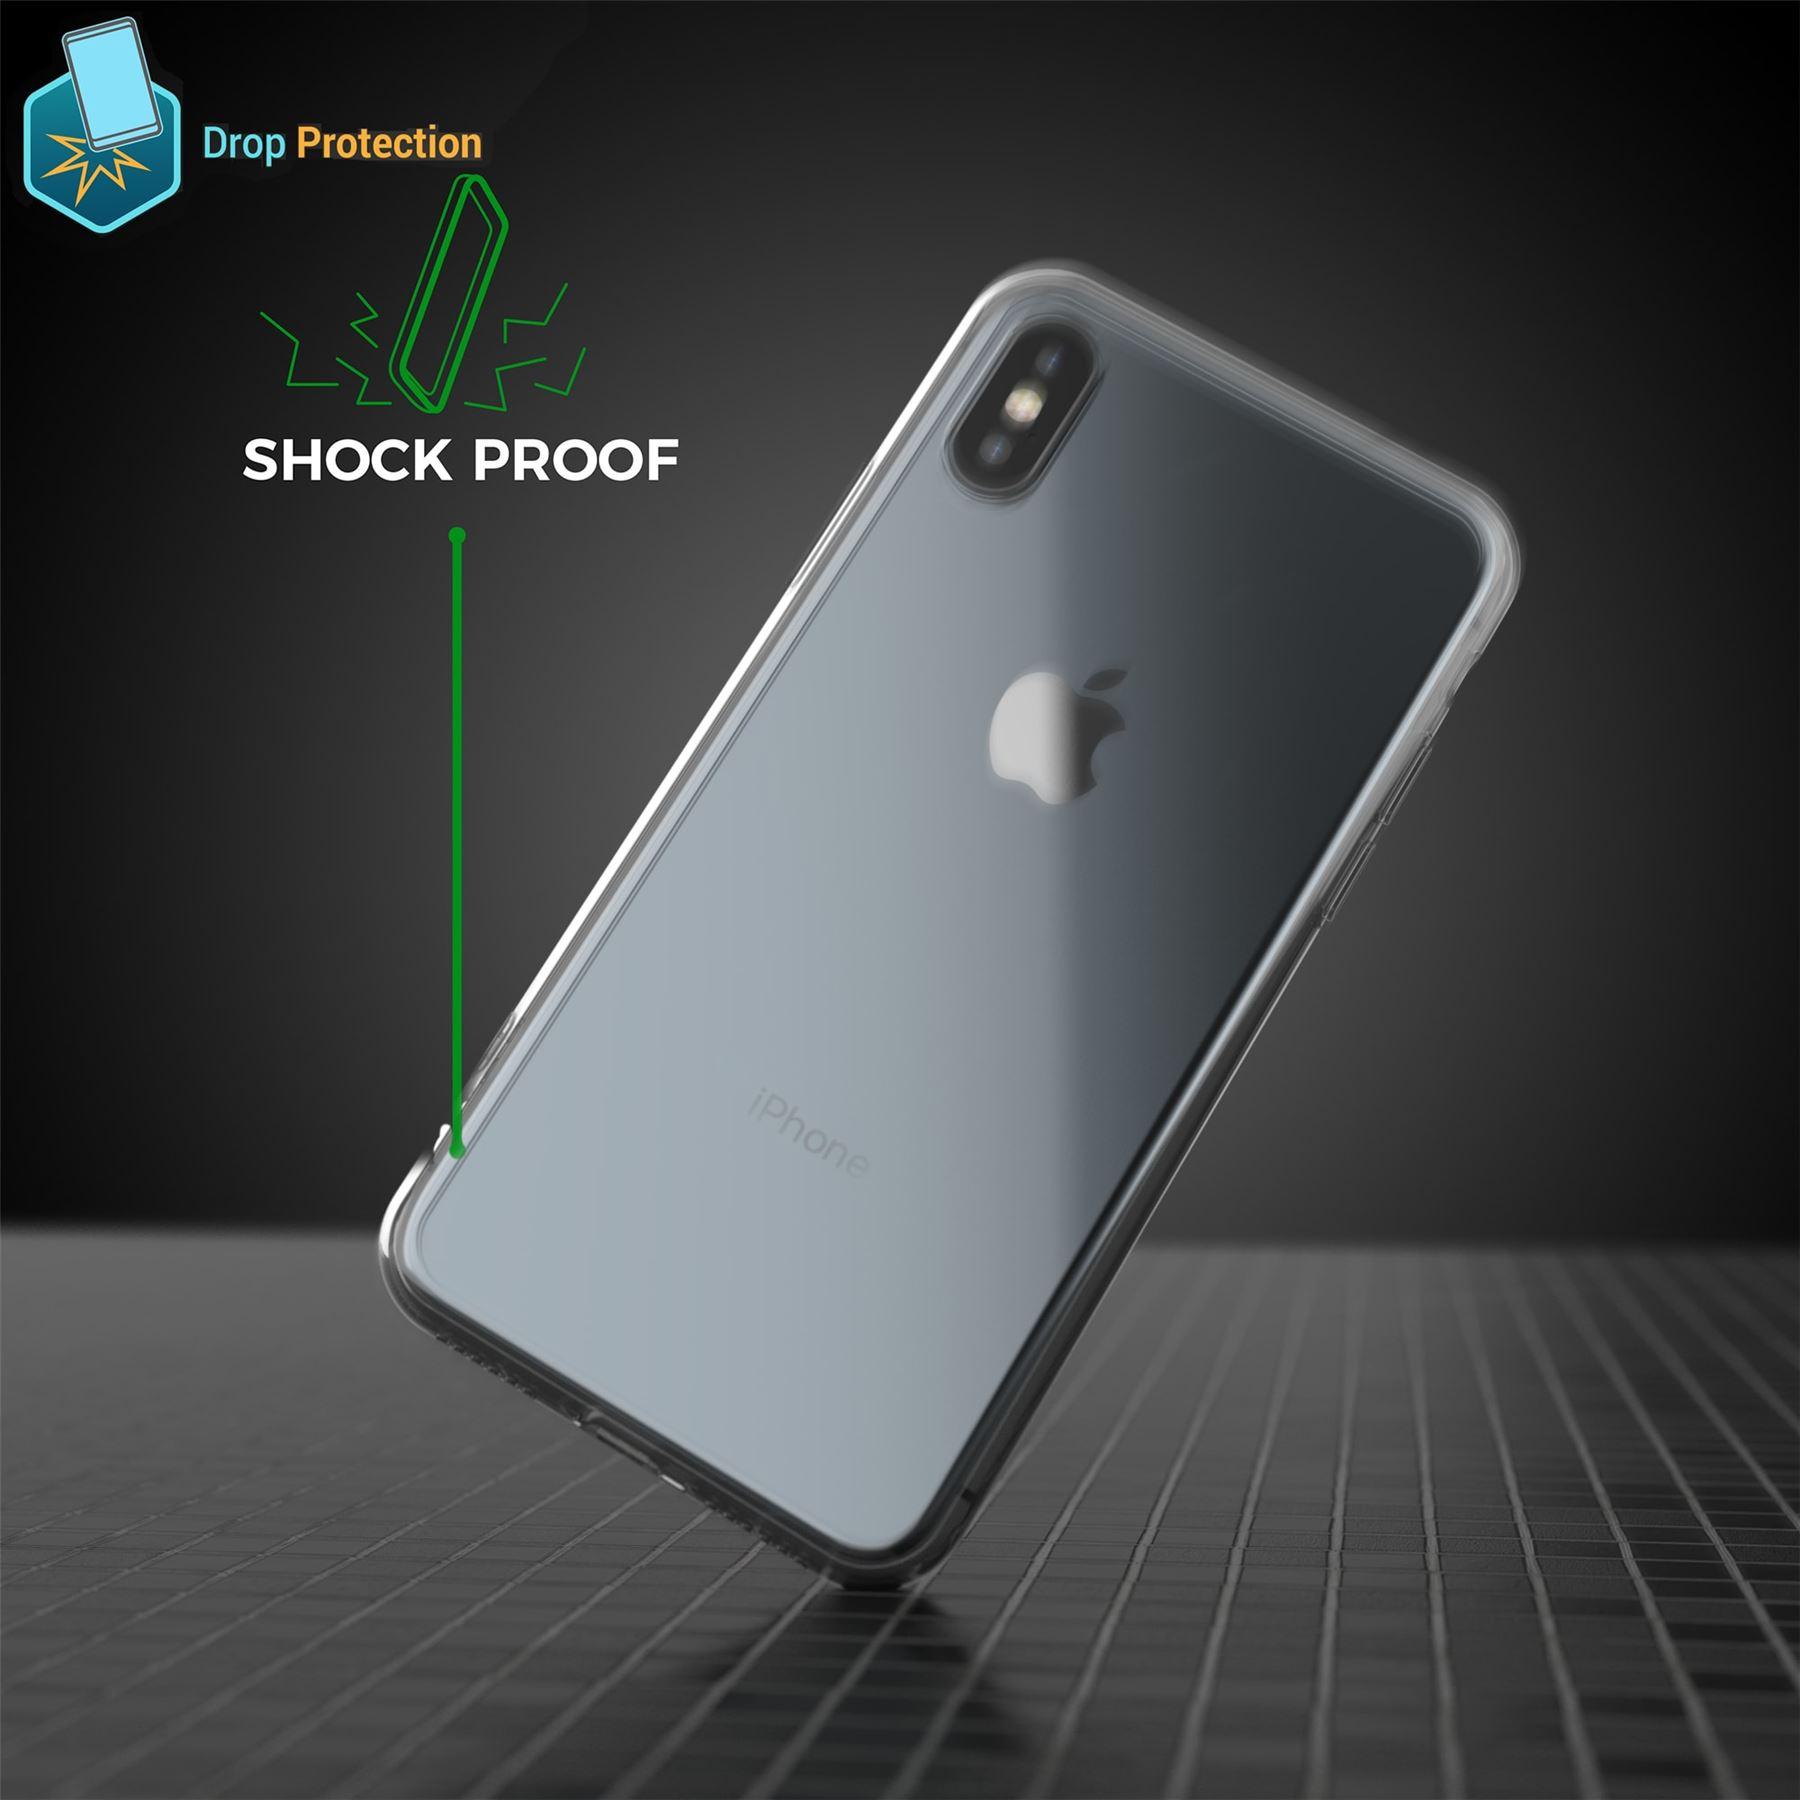 thumbnail 17 - For Apple iPhone XR Xs Max X 8 7 Plus 6 5 Se Case Cover Clear Transparent CS283